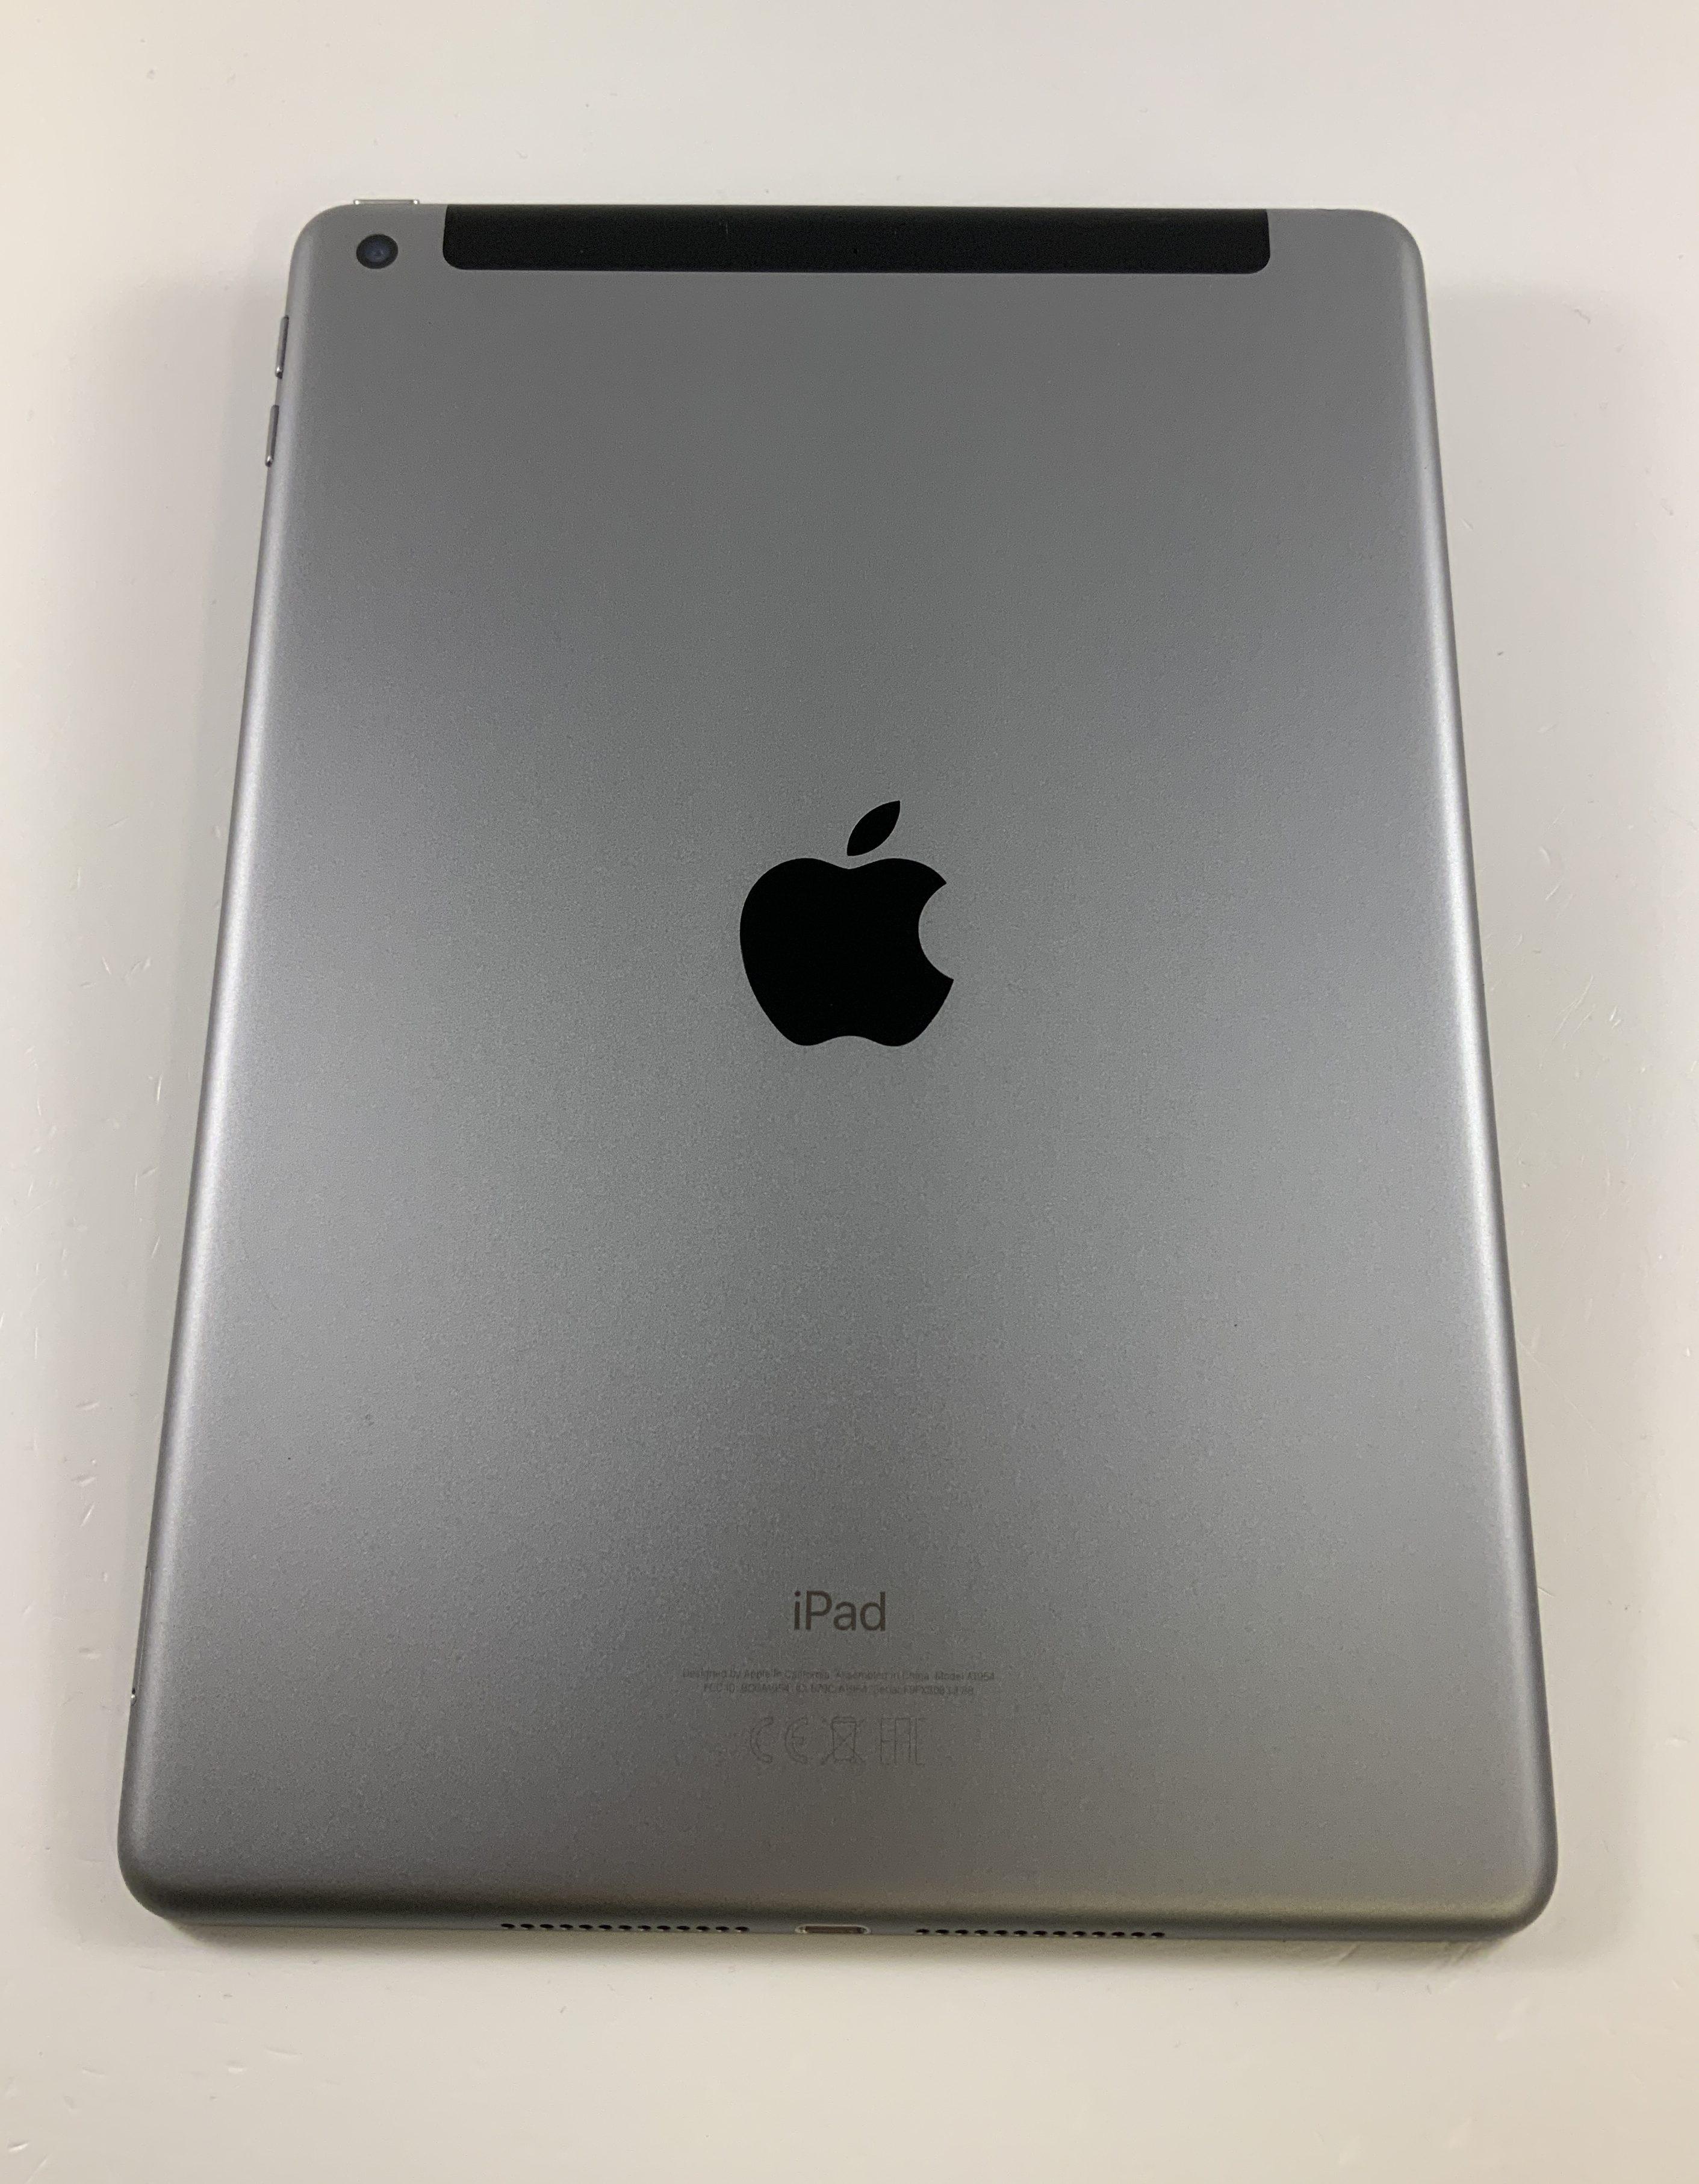 iPad 6 Wi-Fi + Cellular 32GB, 32GB, Space Gray, imagen 2